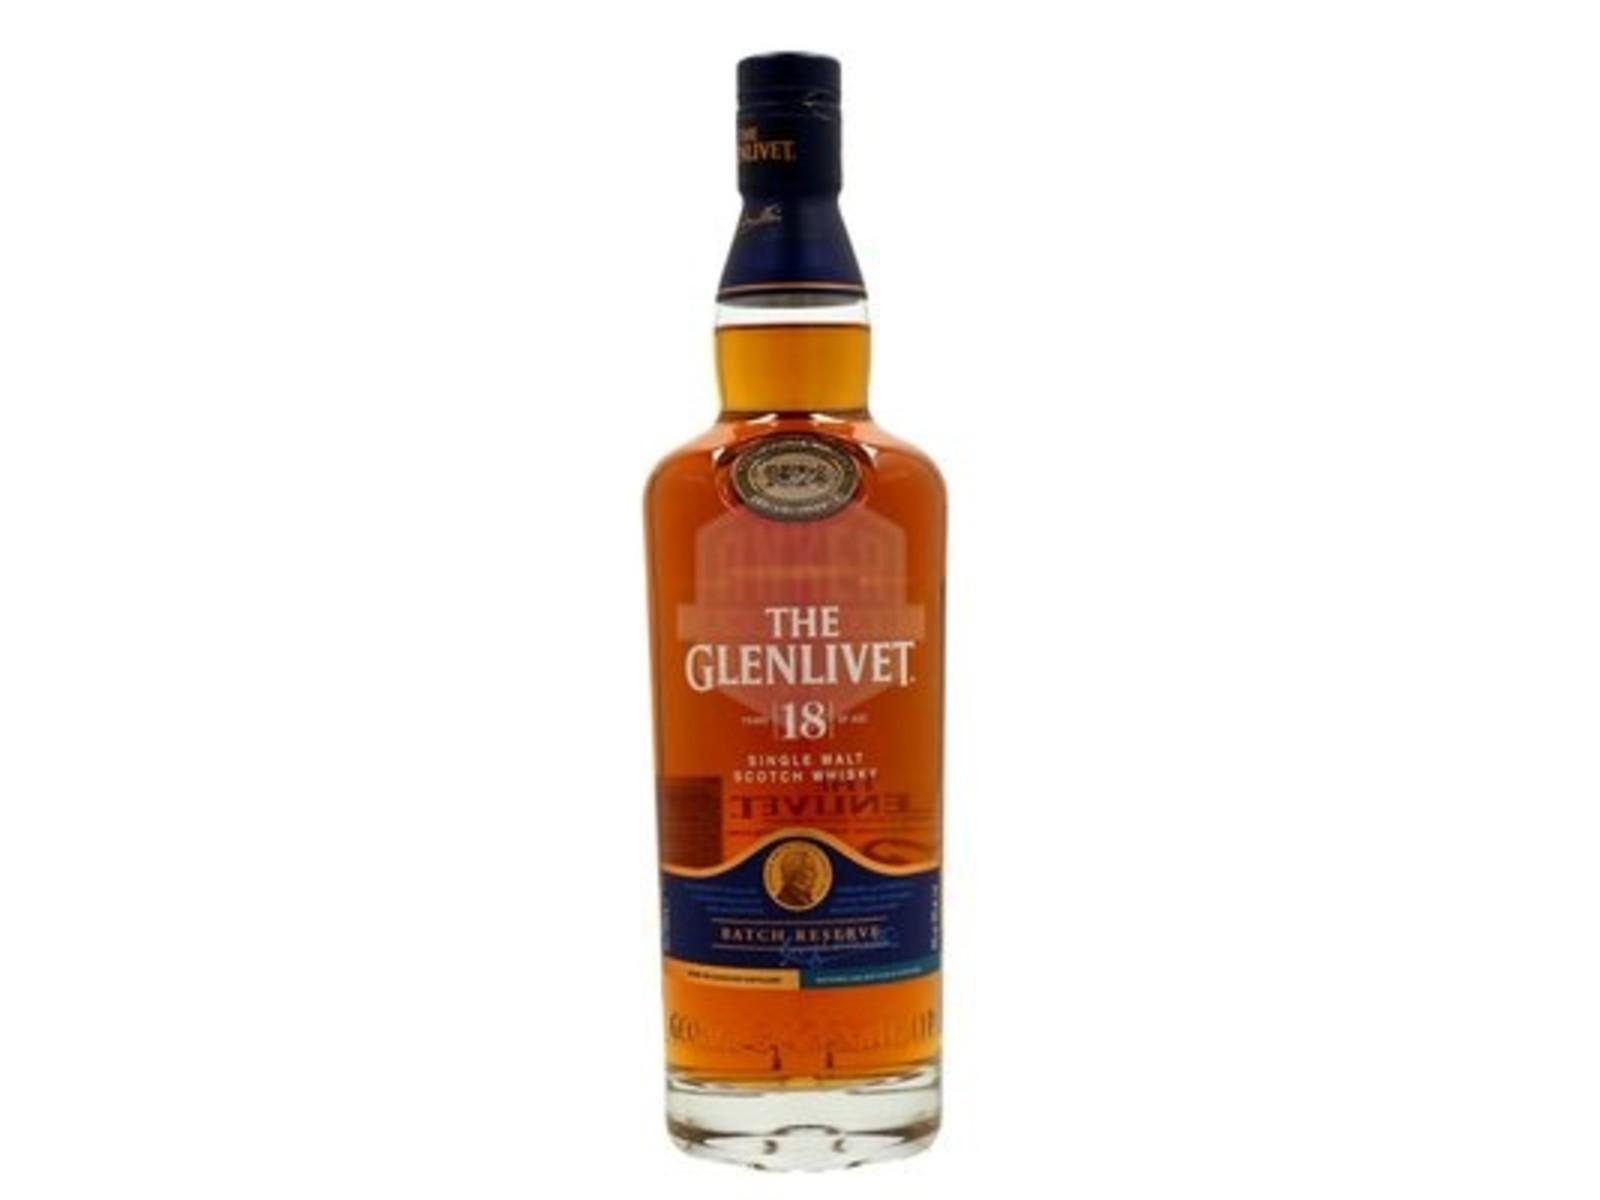 The Glenlivet The Glenlivet / 18 years / whisky / 0,7L